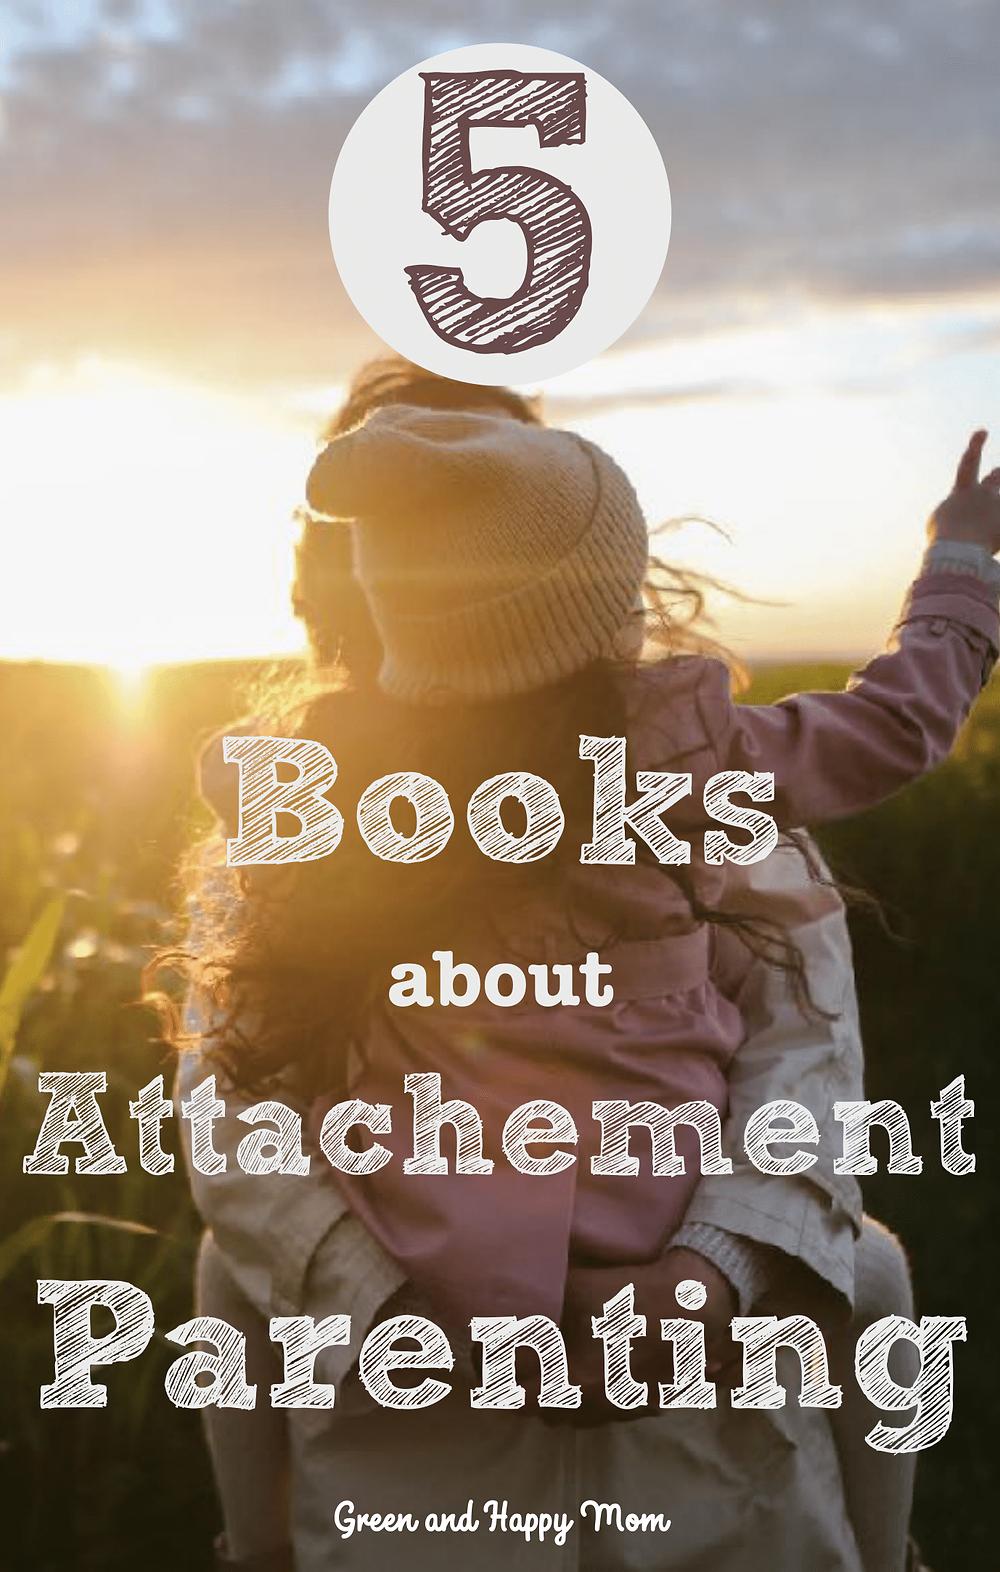 Books about attachment parenting